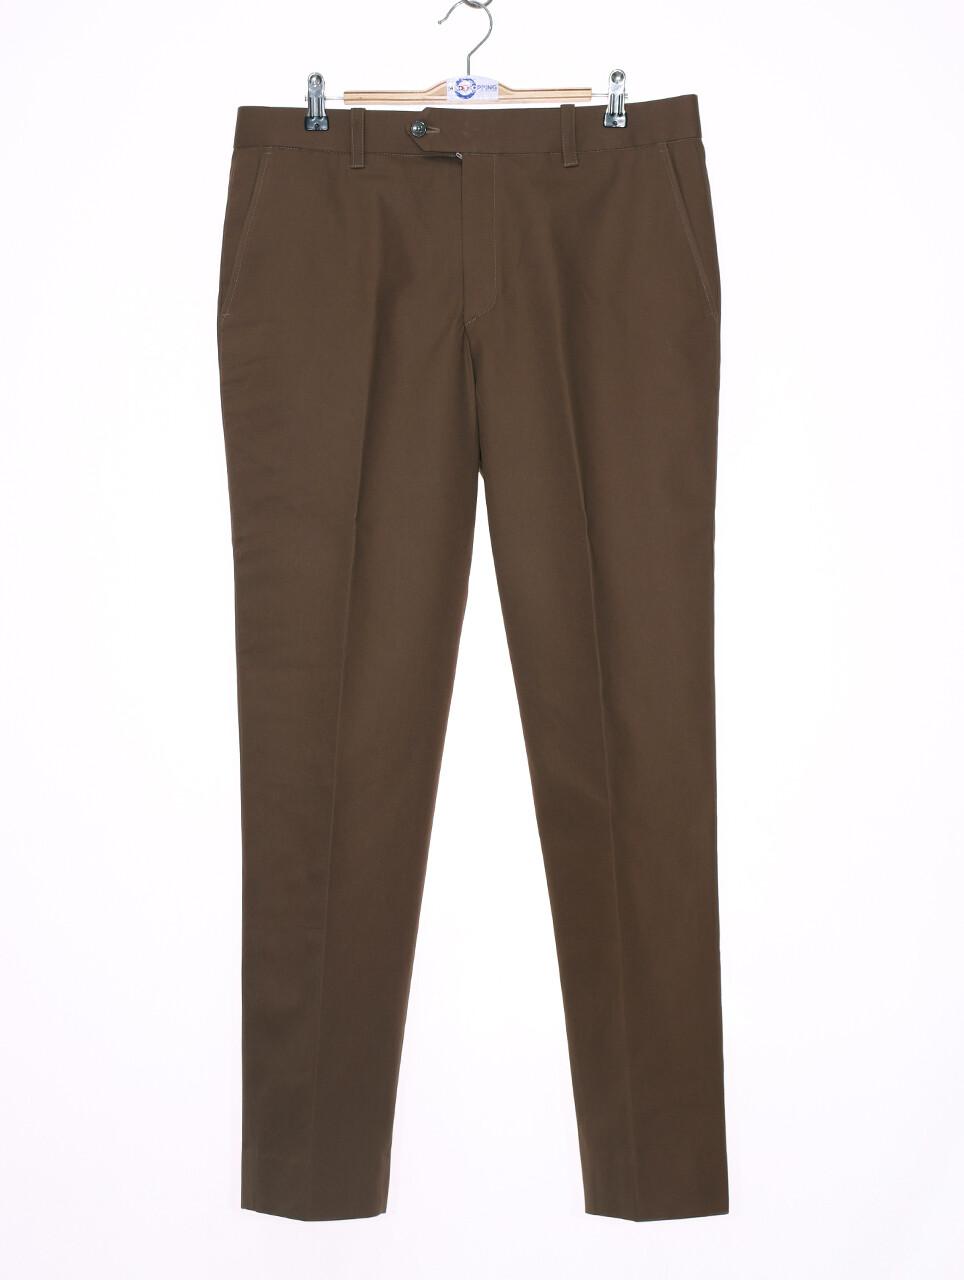 Sta Press Trousers  60s Mod Classic Brown  Mens Trouser